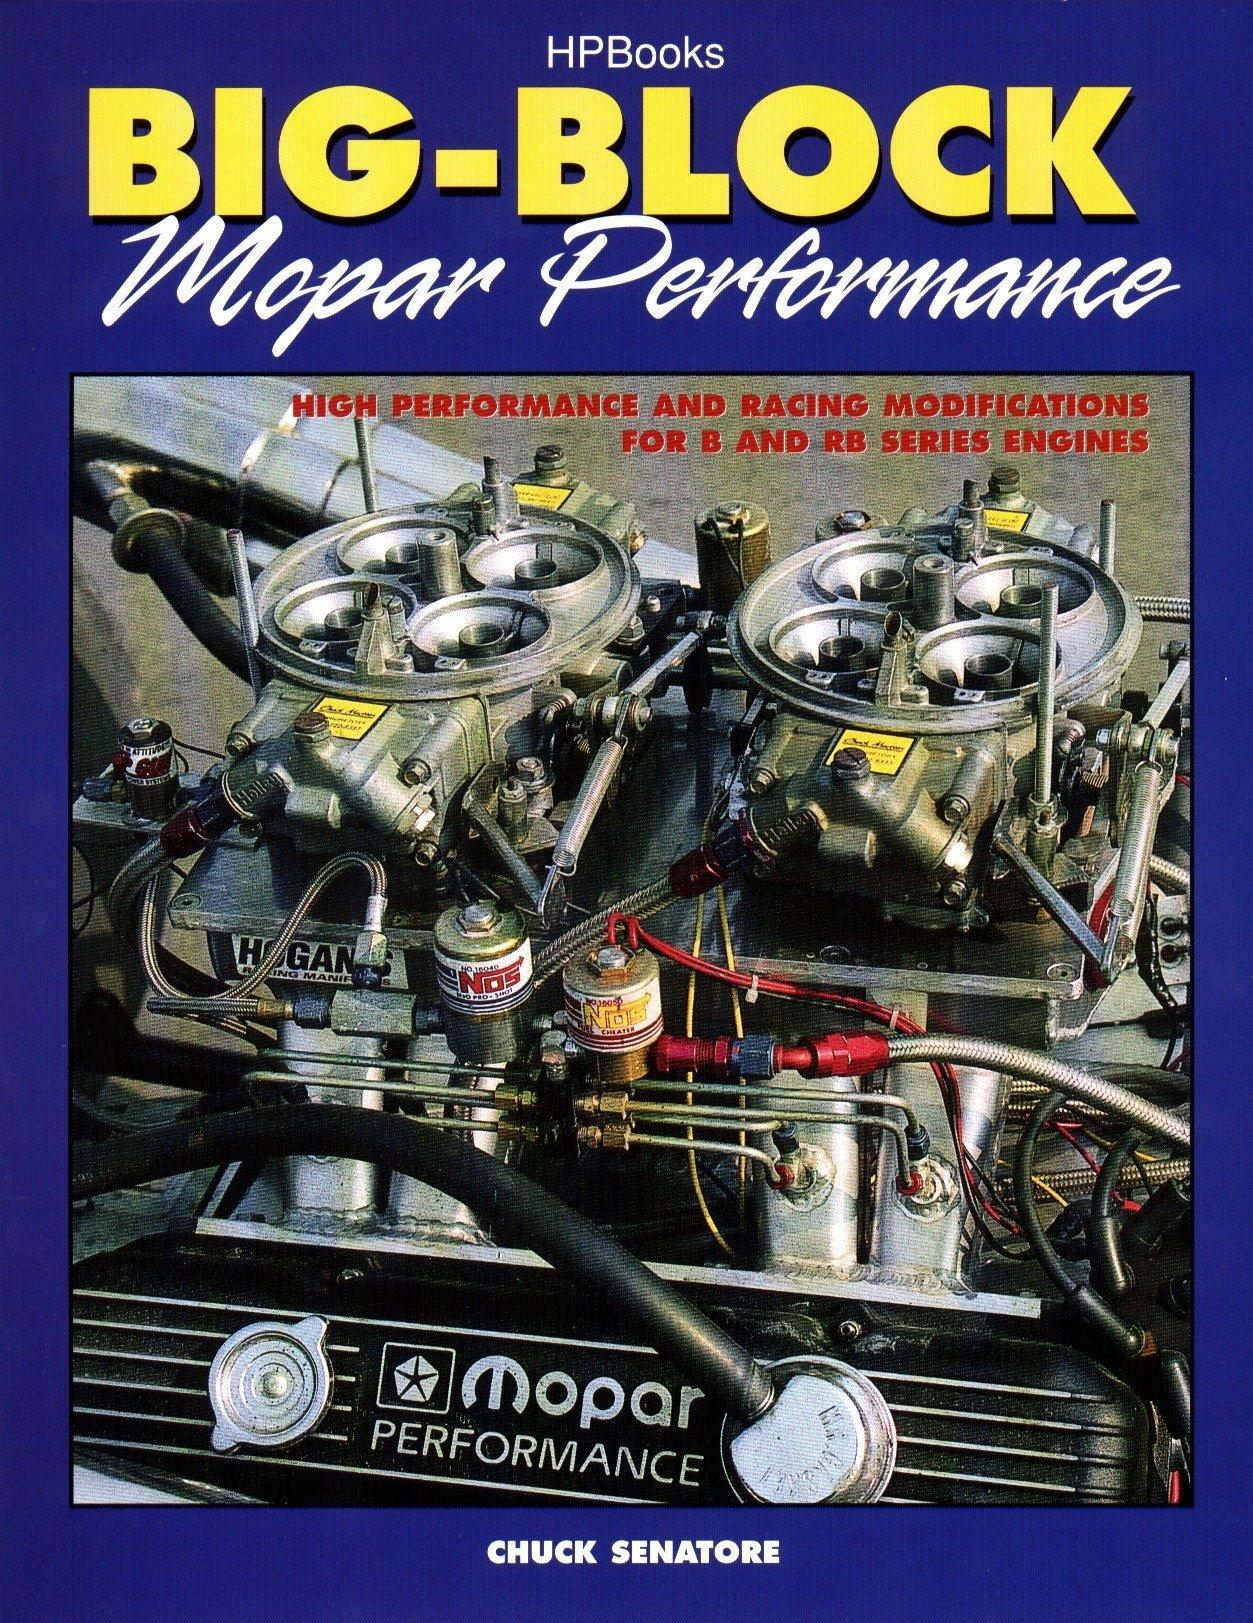 Big Block Mopar Performance - High Performance and Racing